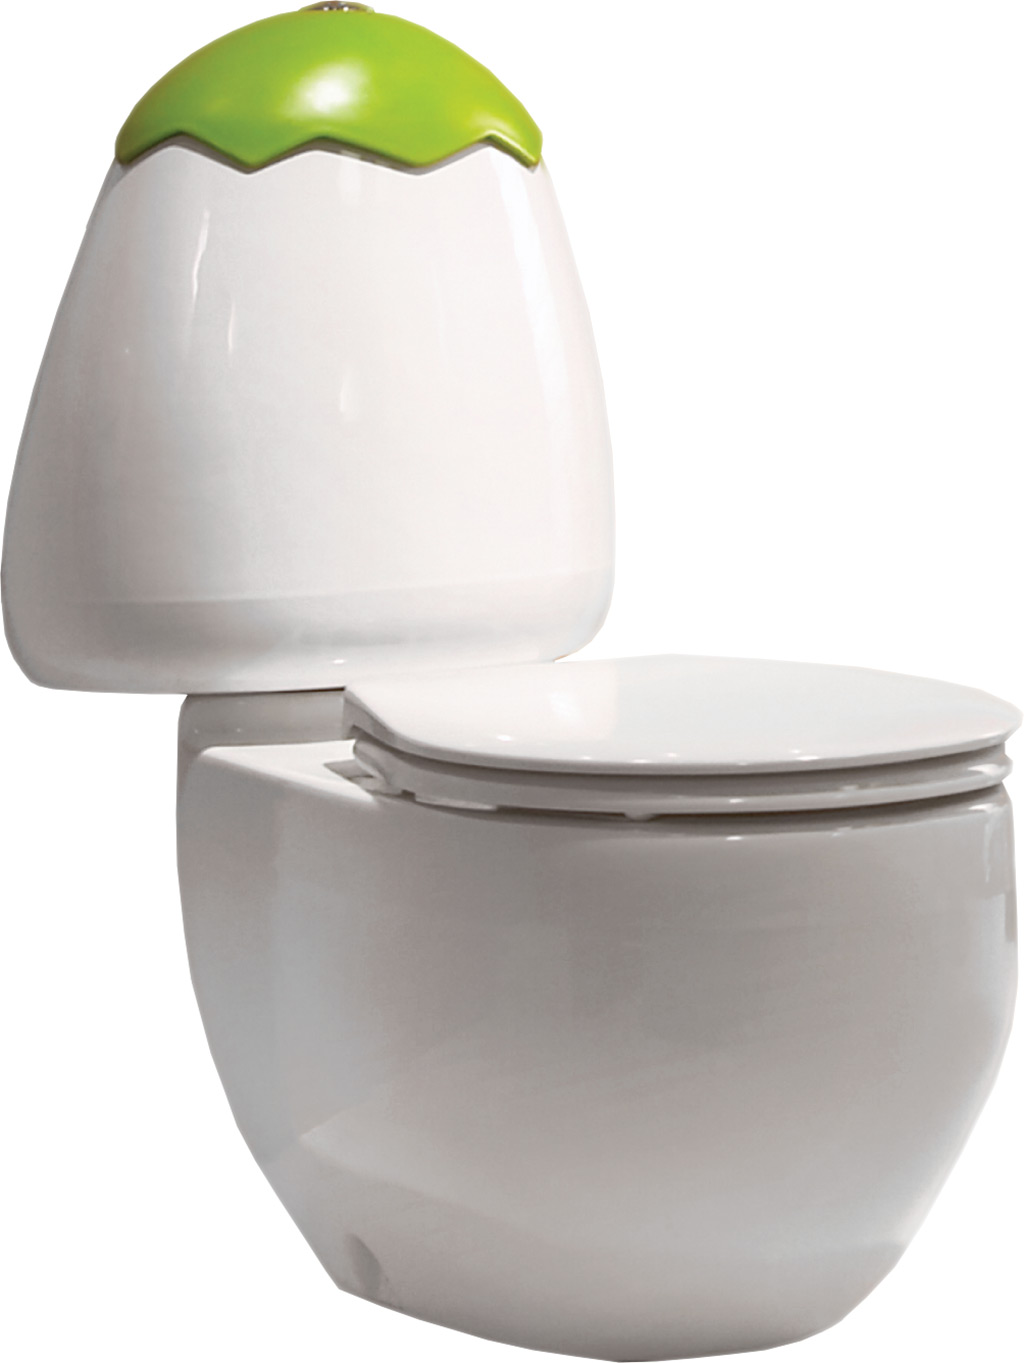 egg junior children s products children s toilets childcare